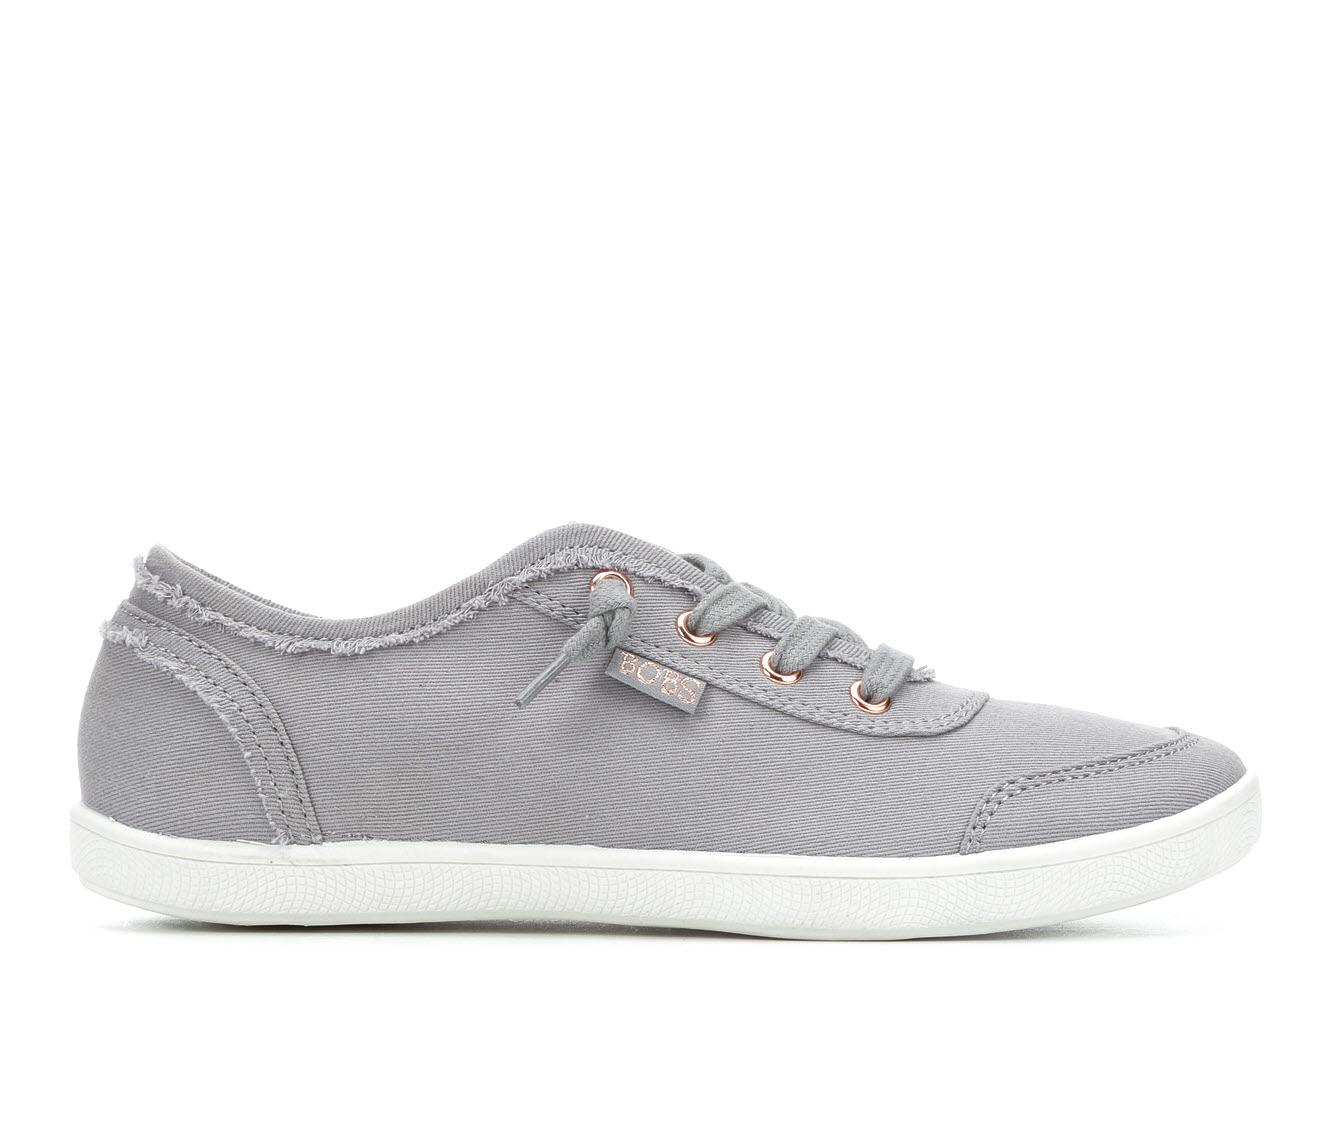 BOBS B Cute Women's Shoe (Gray Canvas)